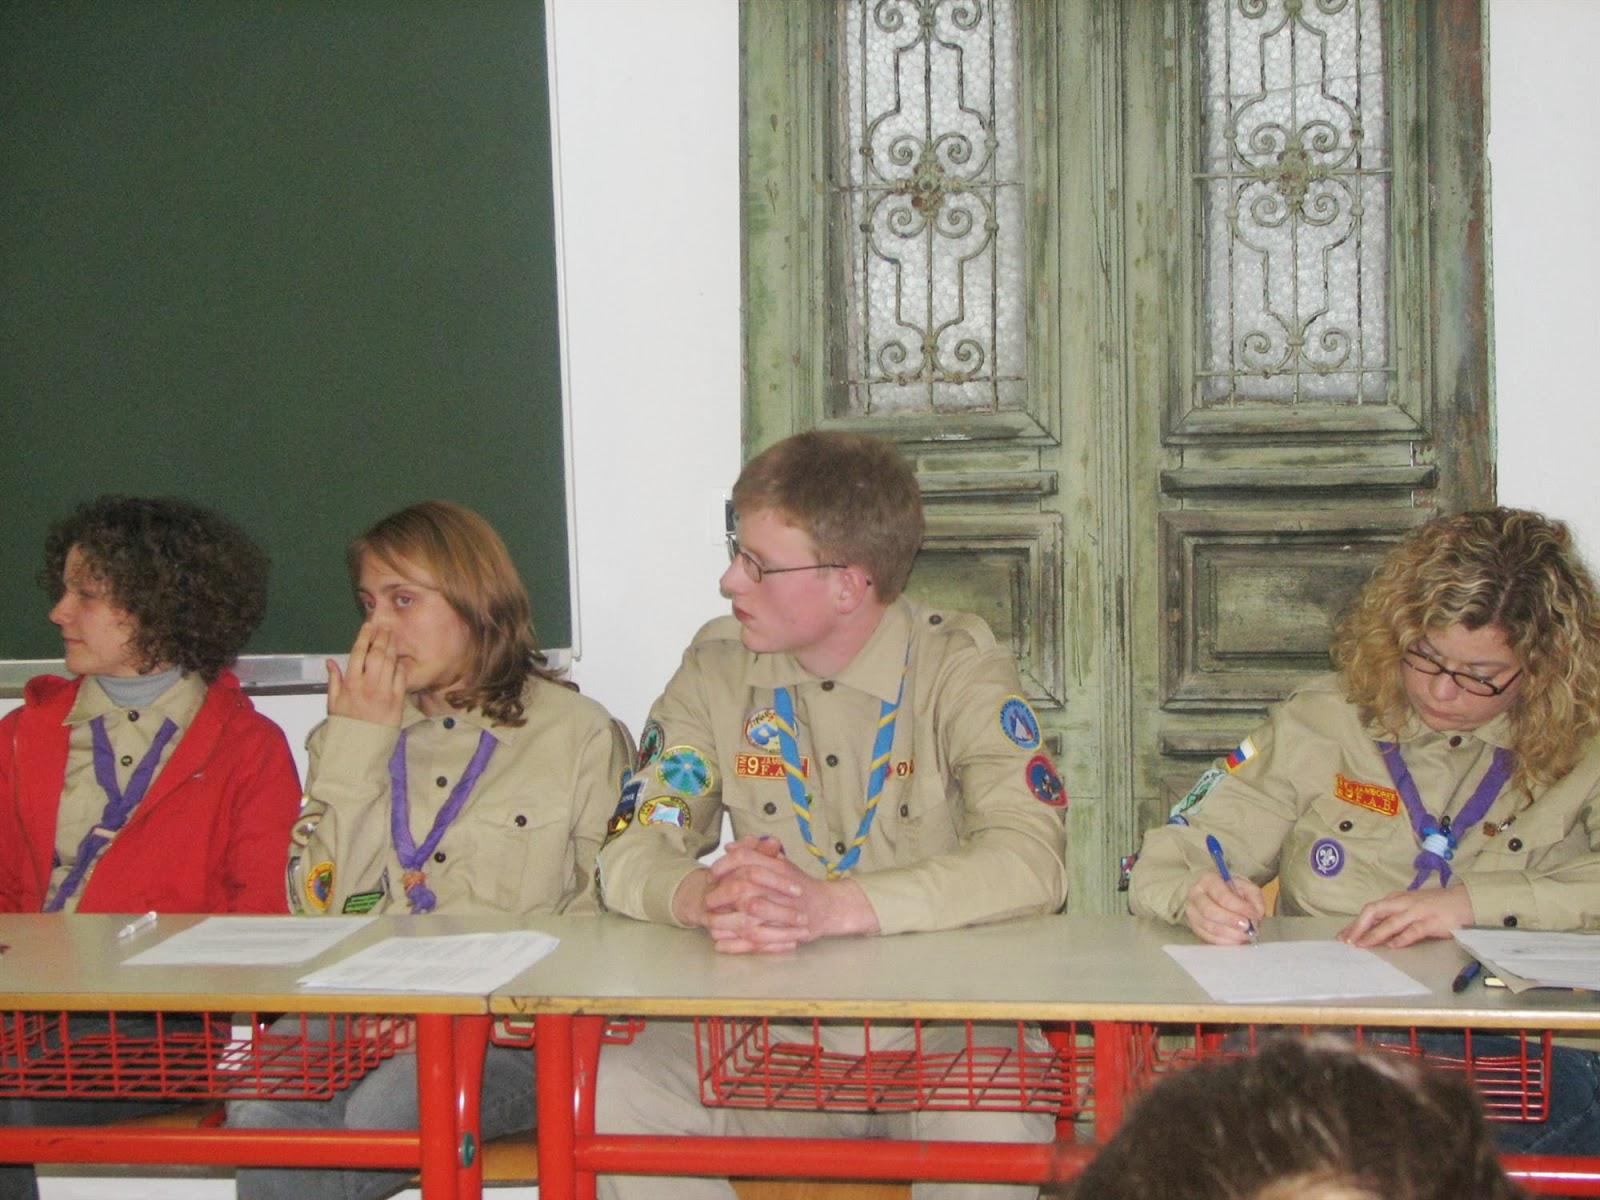 Občni zbor, Ilirska Bistrica 2006 - IMG_5737.jpg